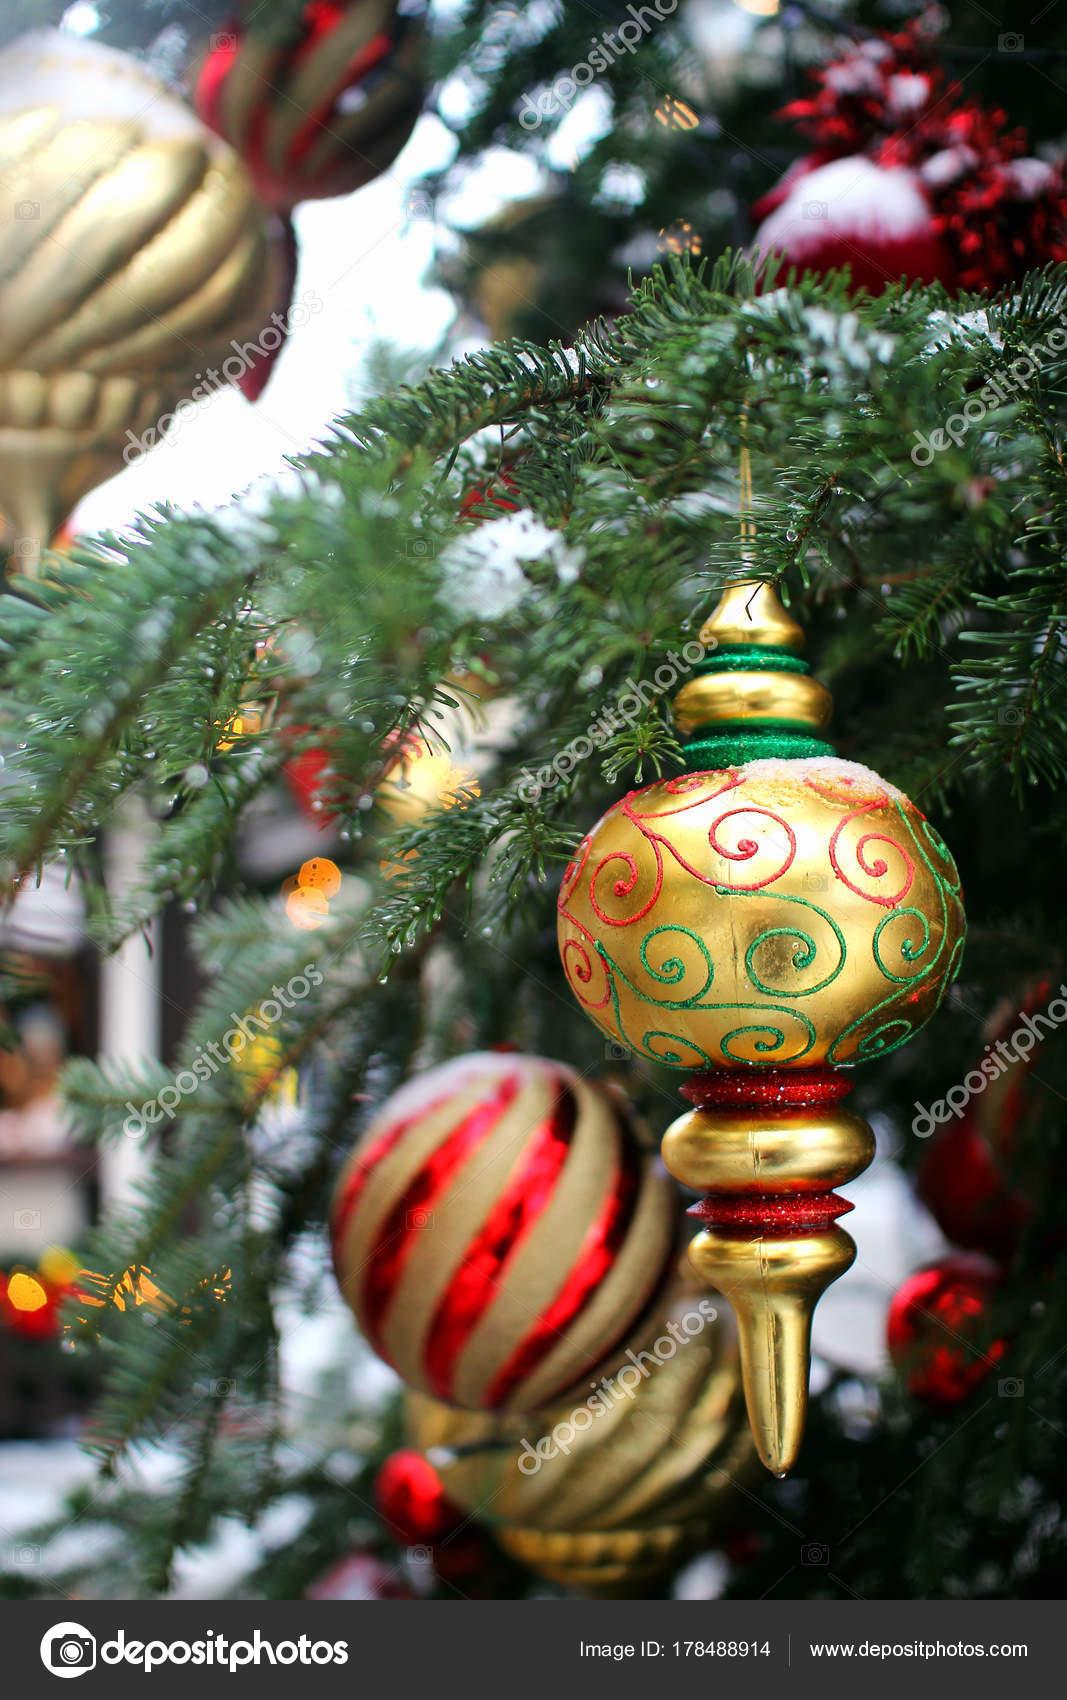 Fotos fotografias de arboles de navidad decorados decorado rboles navidad durante las Imagenes de arboles navidad decorados